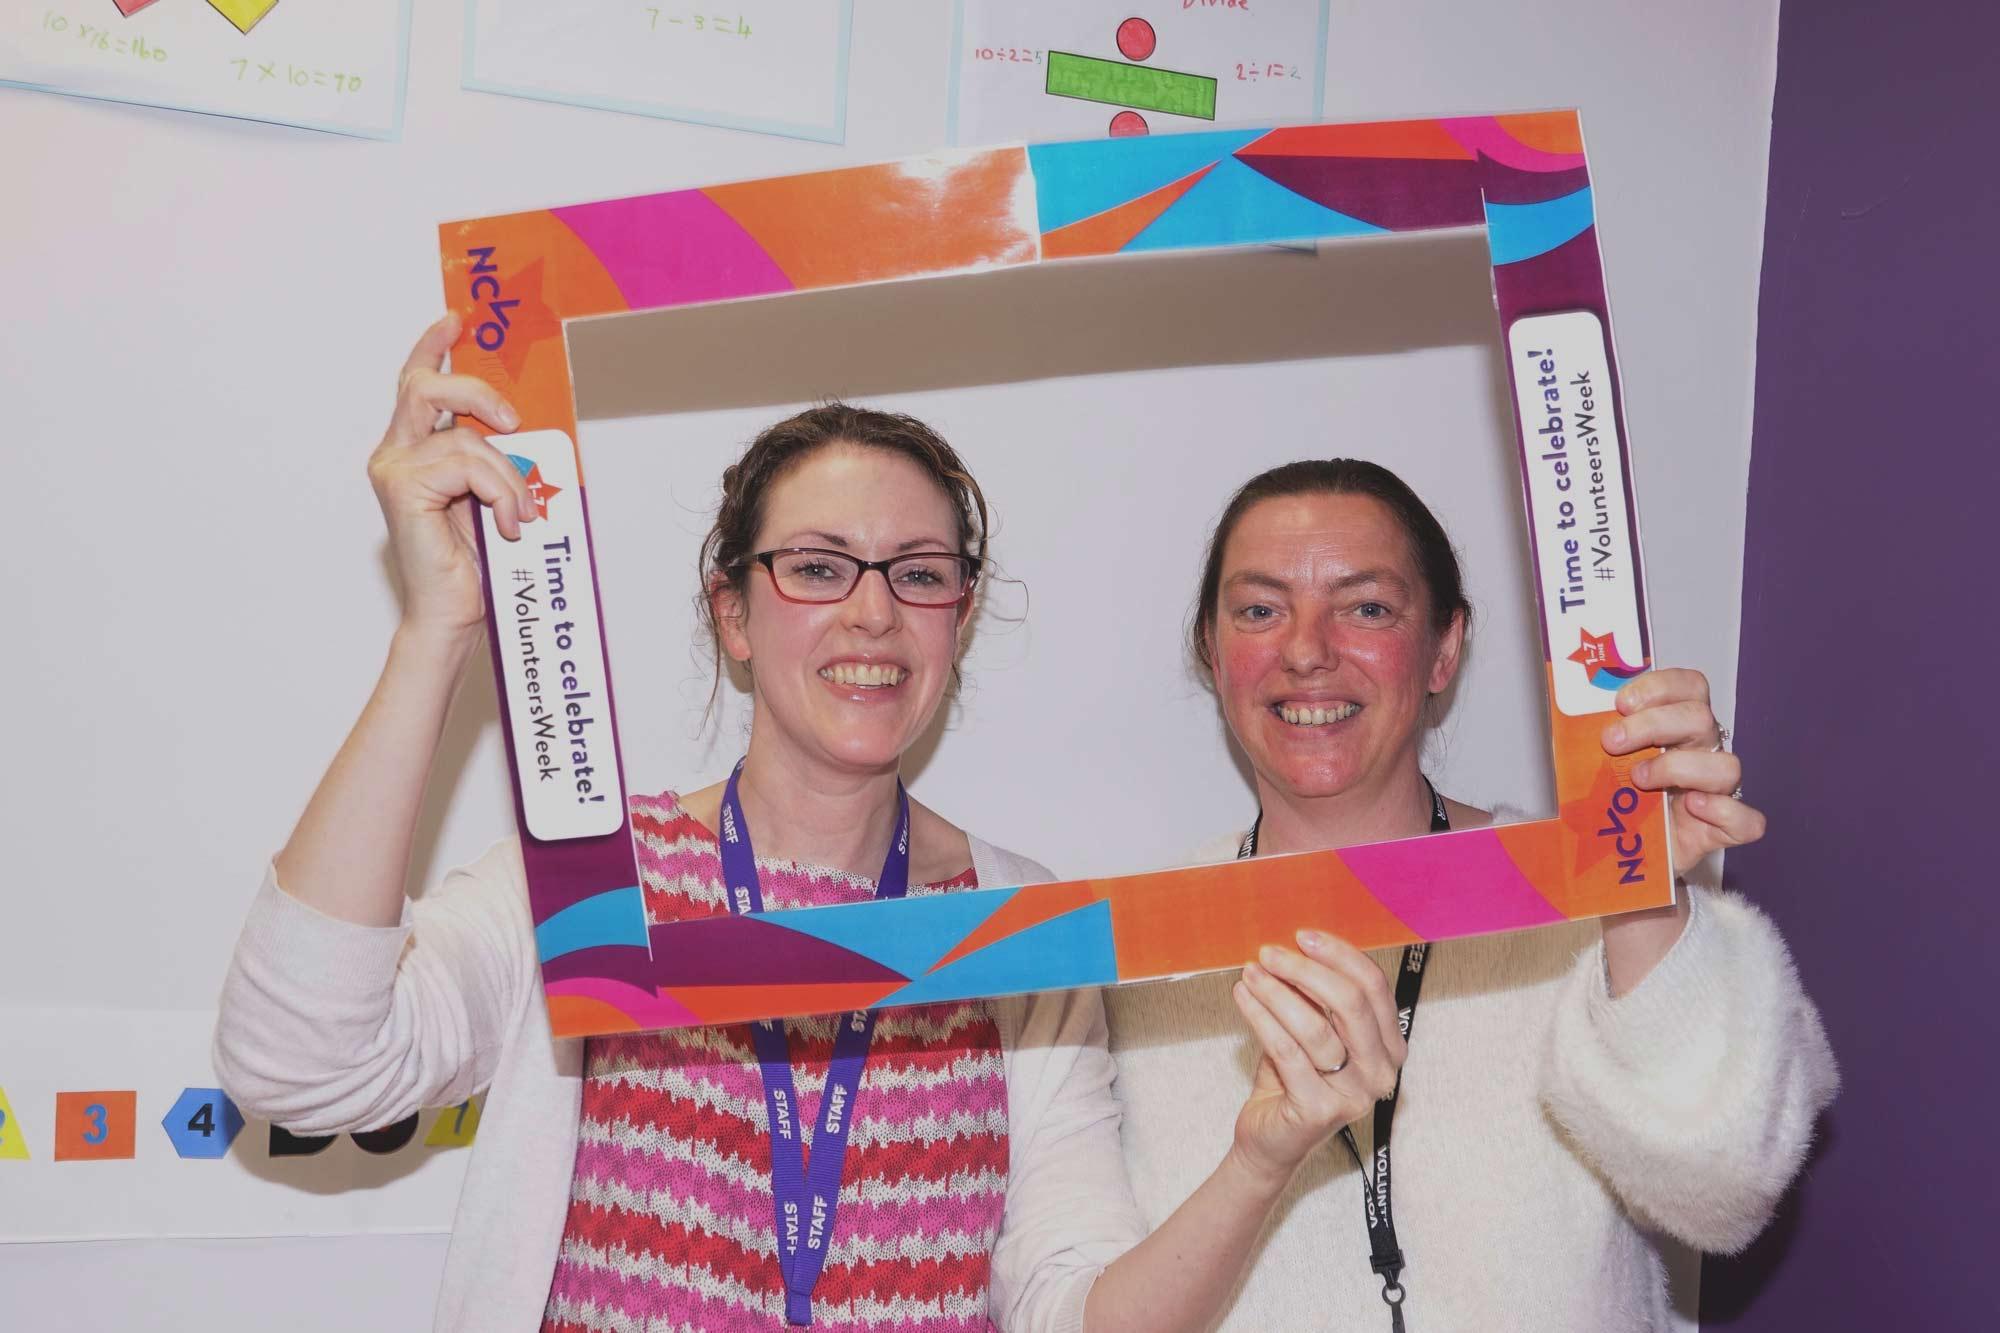 Emmi Wainwright, volunteer co-ordinator and Helen Cowie, a new volunteer